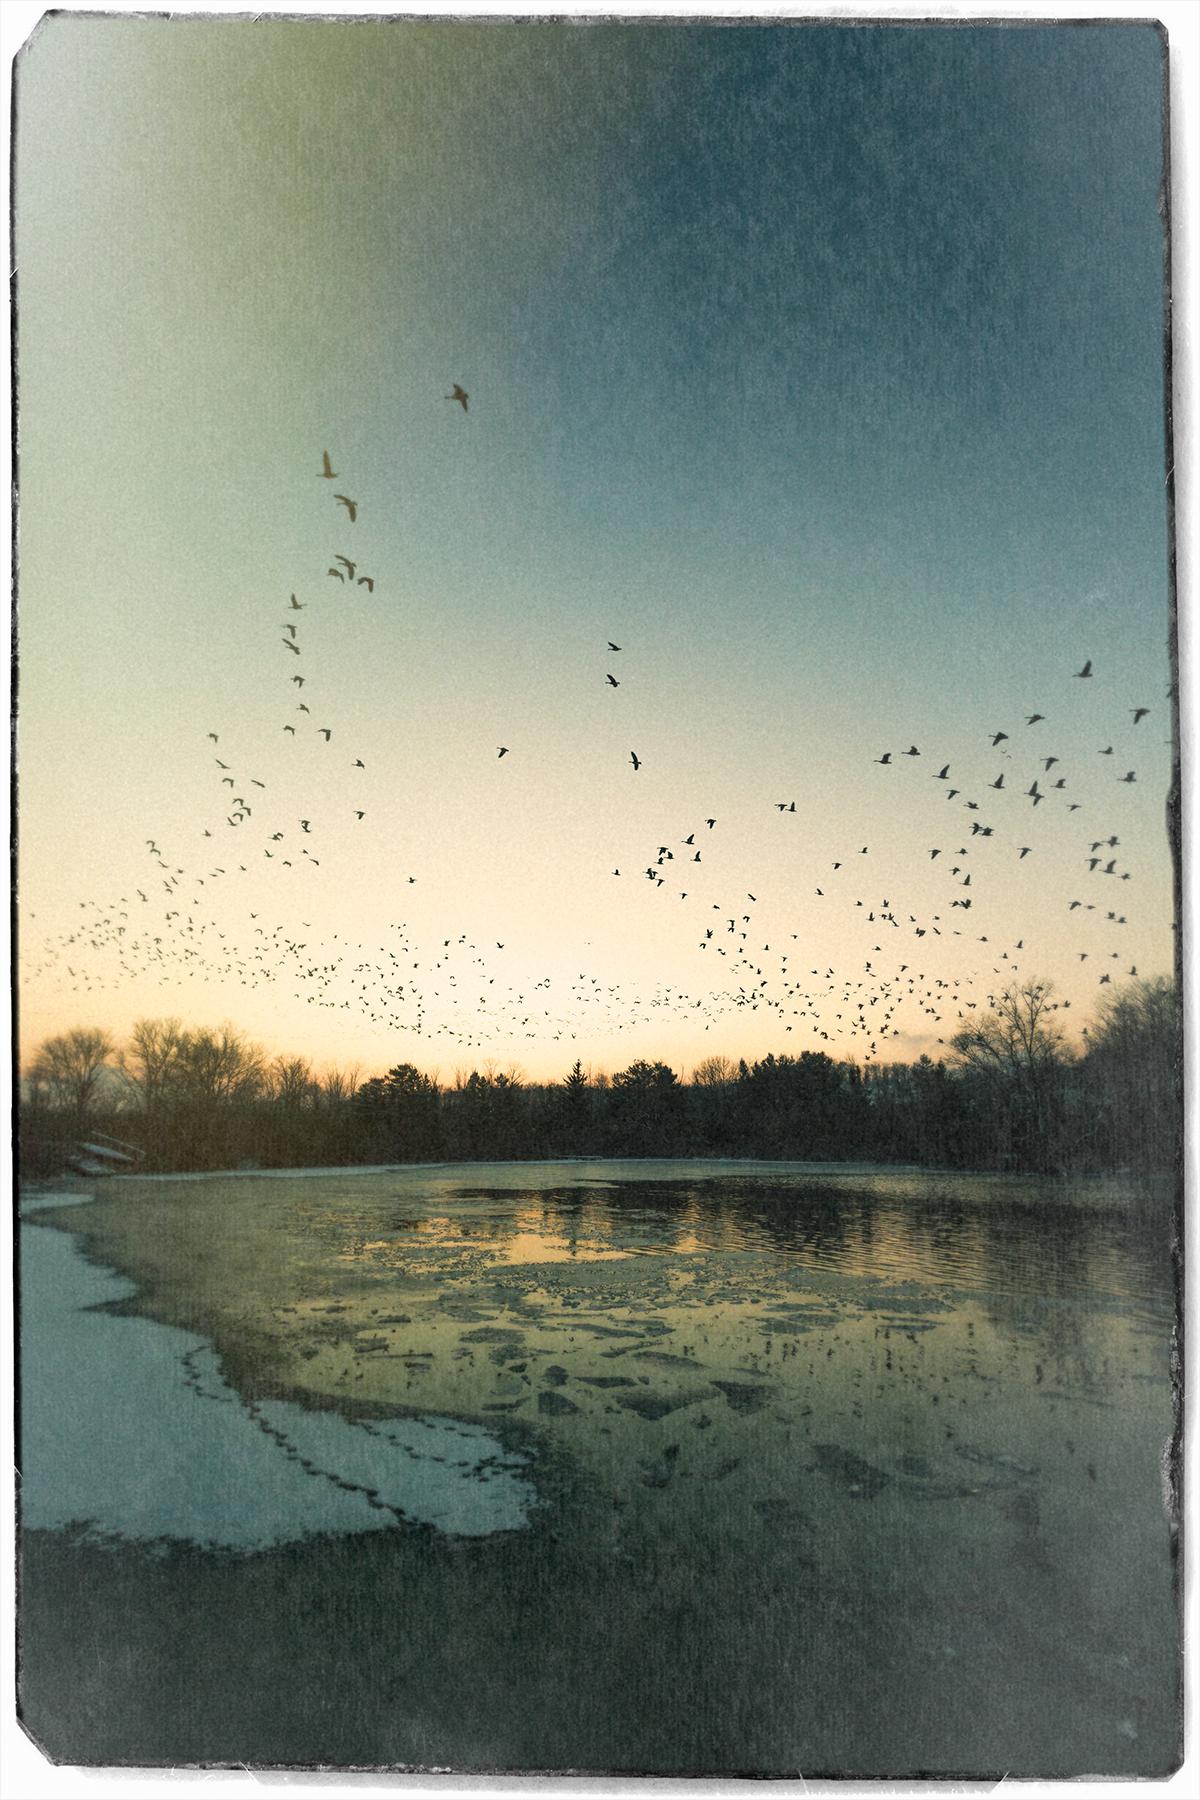 Pond-&-Geese-4.jpg